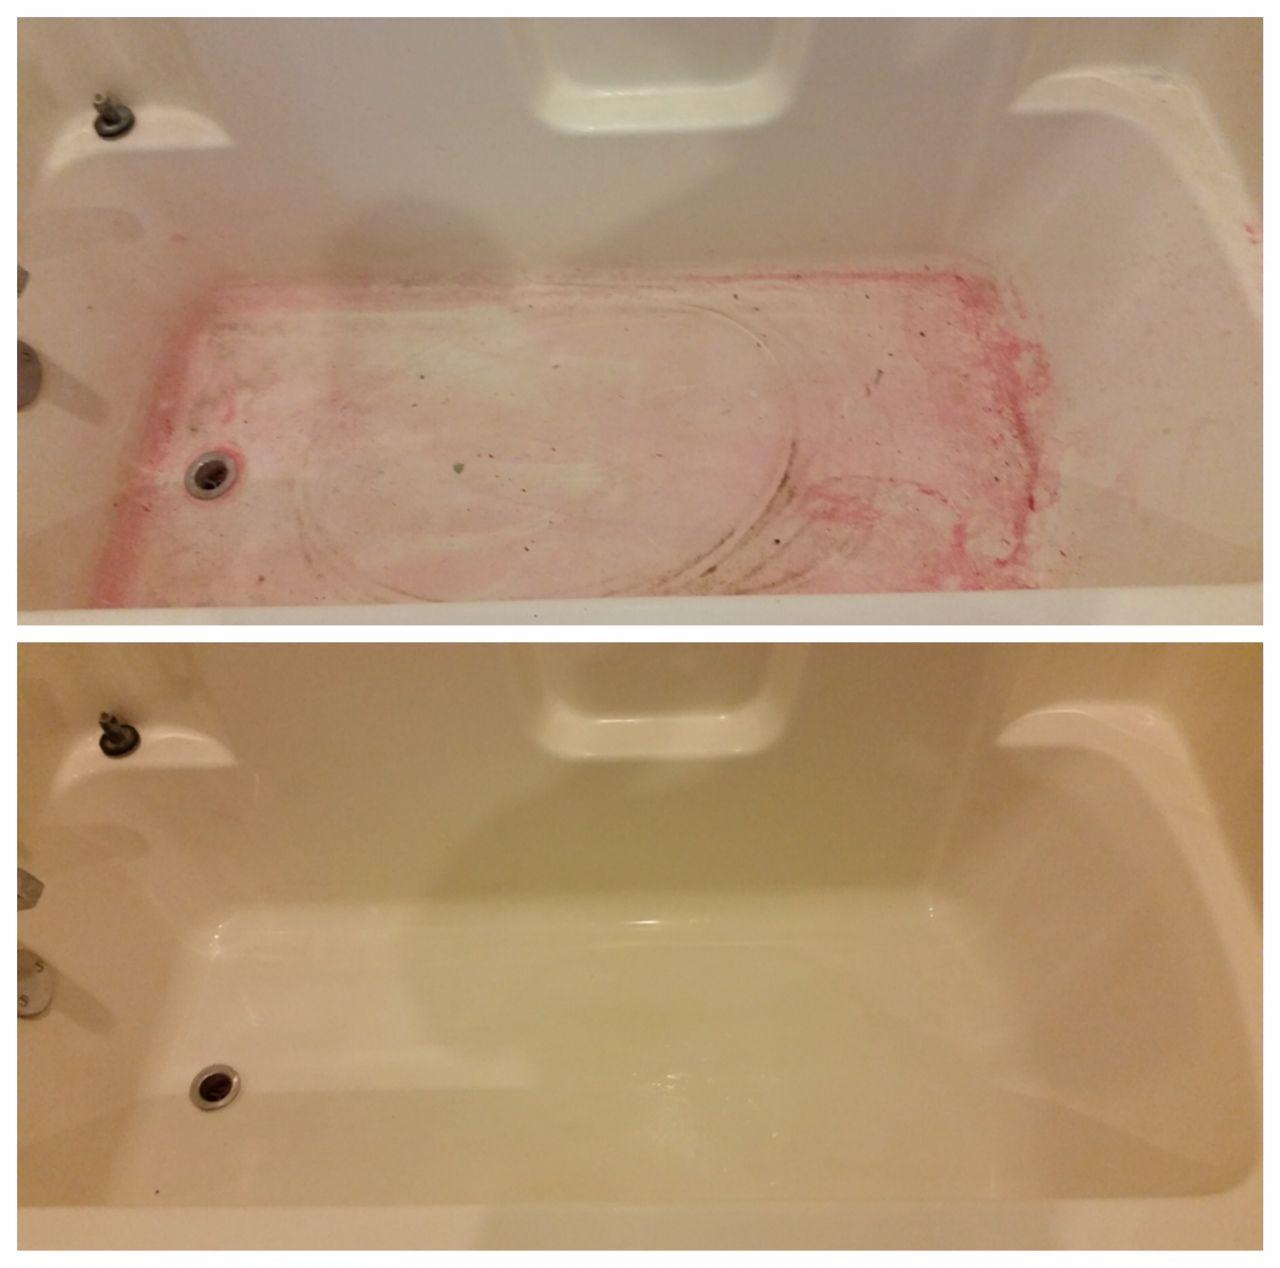 c194704cd710518a92615a5e2bd14711 - How To Get Rid Of Hair Dye Stains In Shower